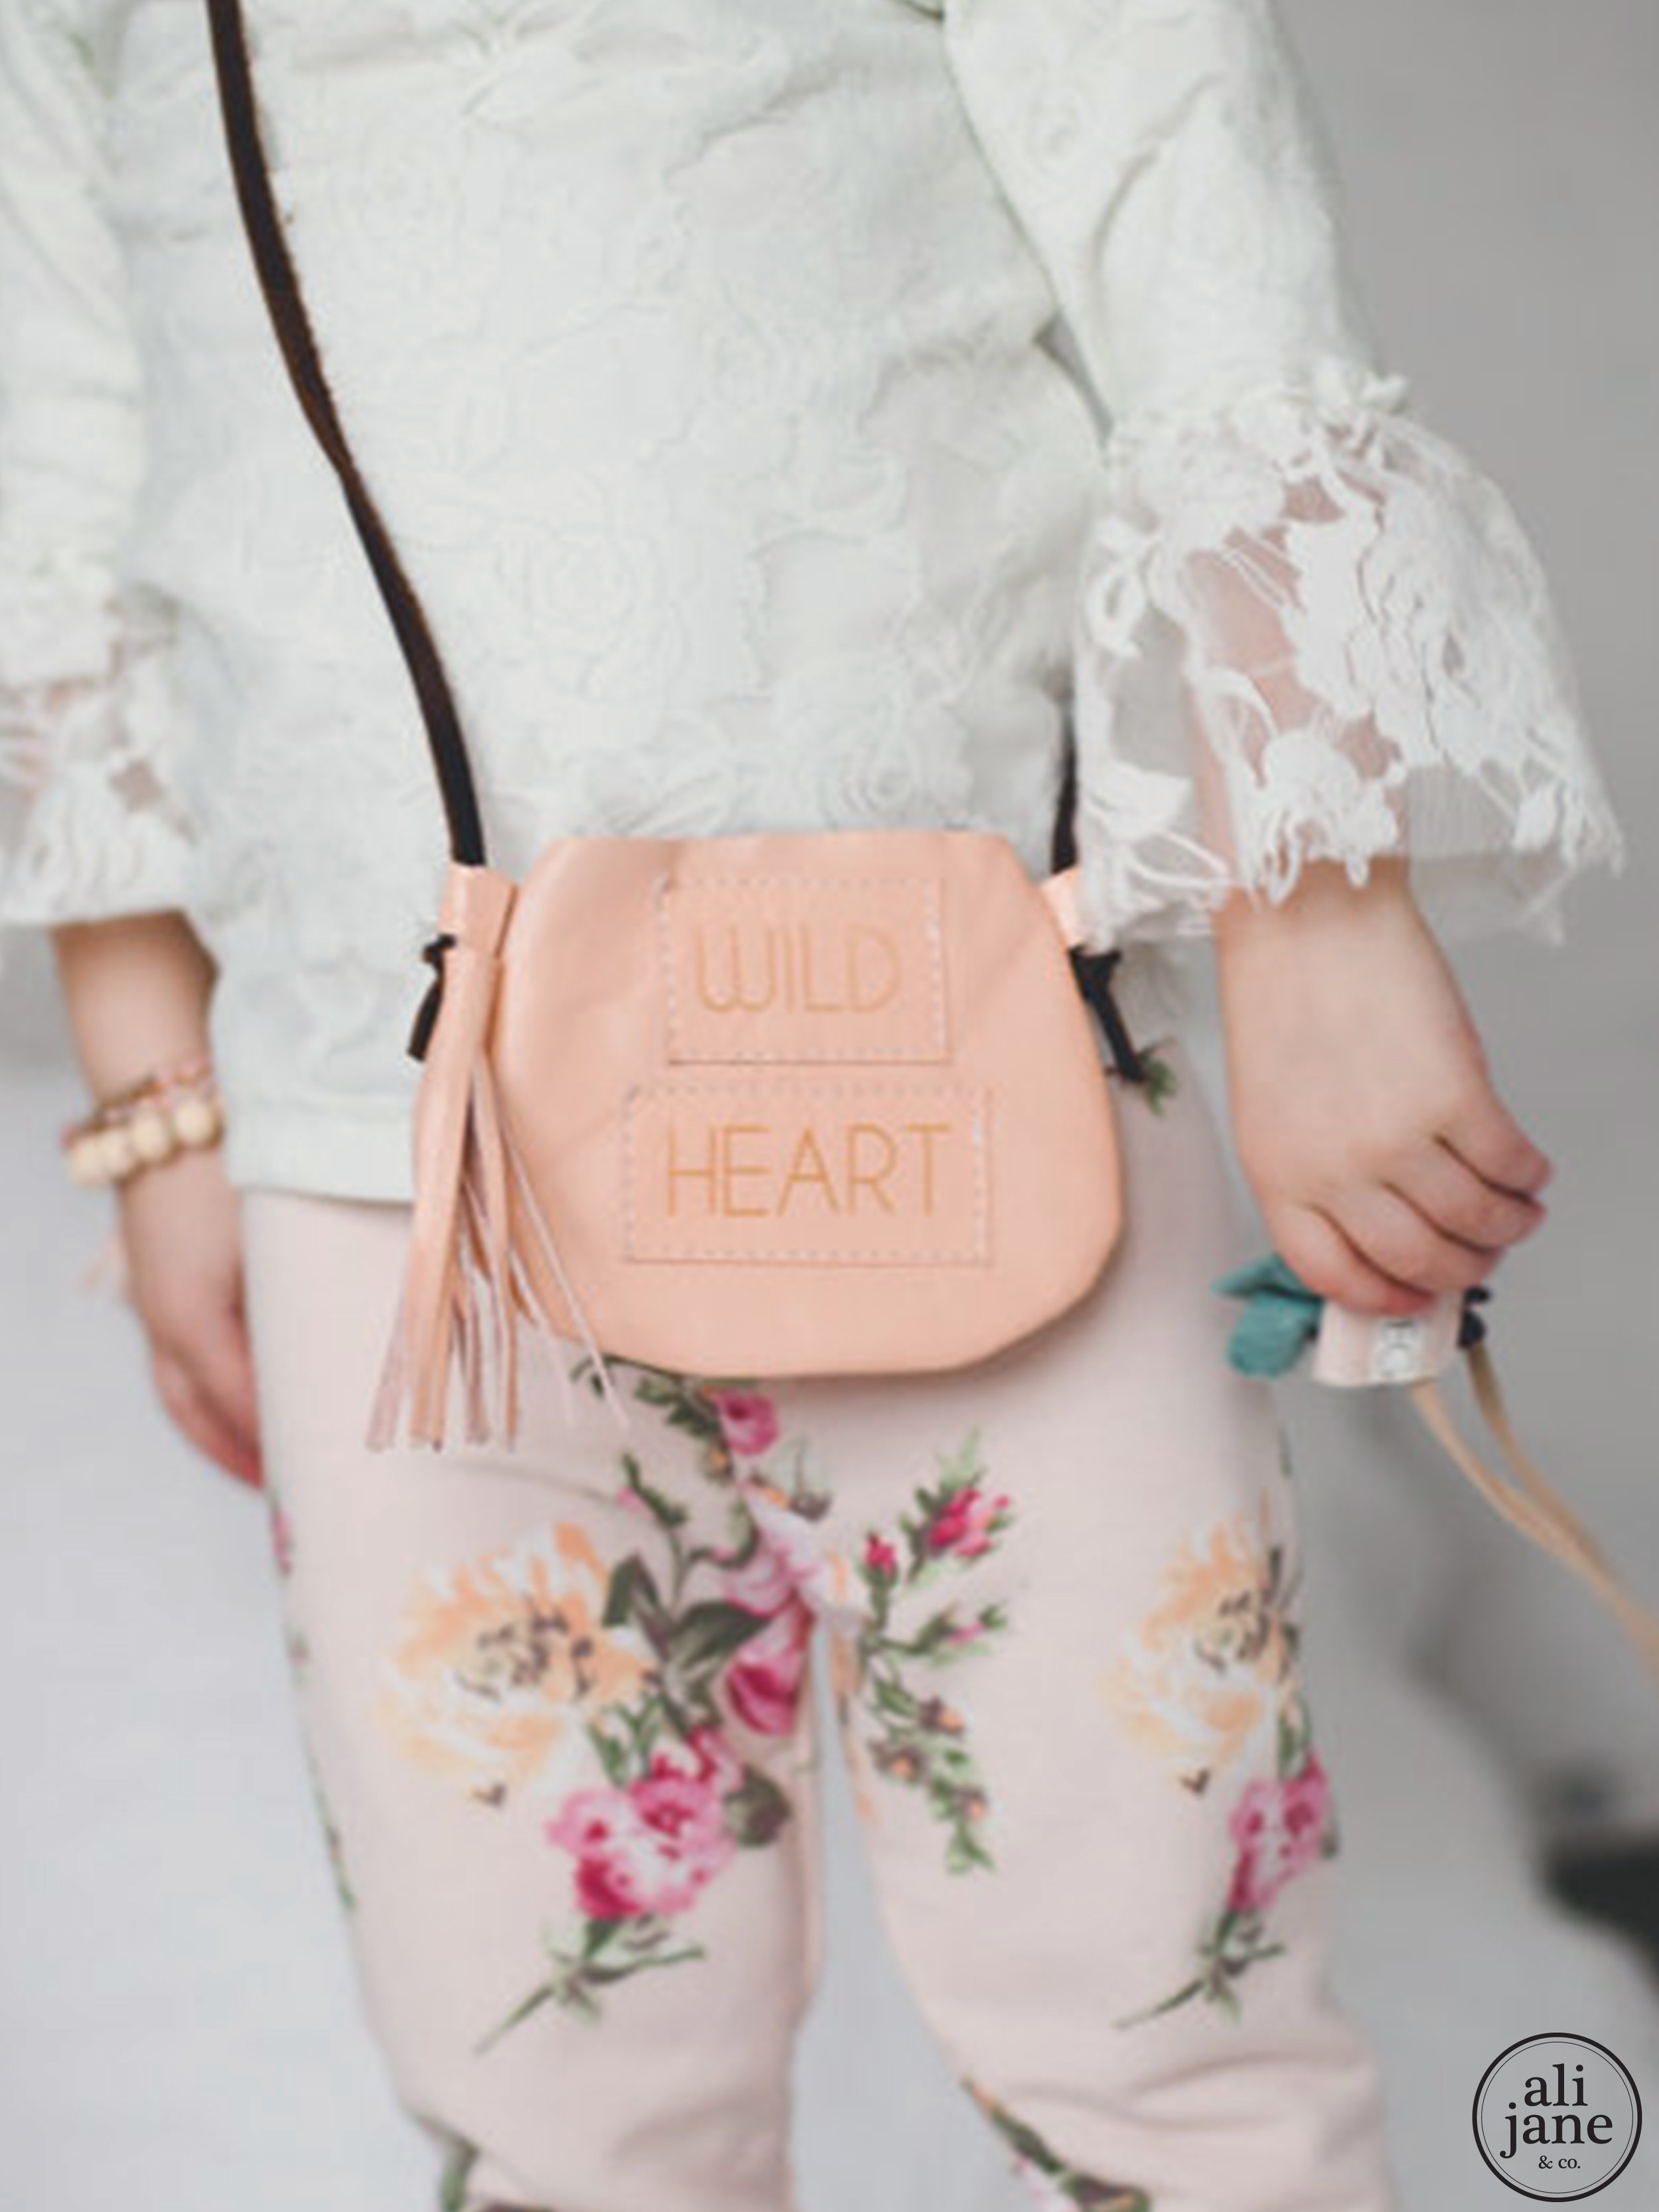 Mini pink WILD HEART satchel